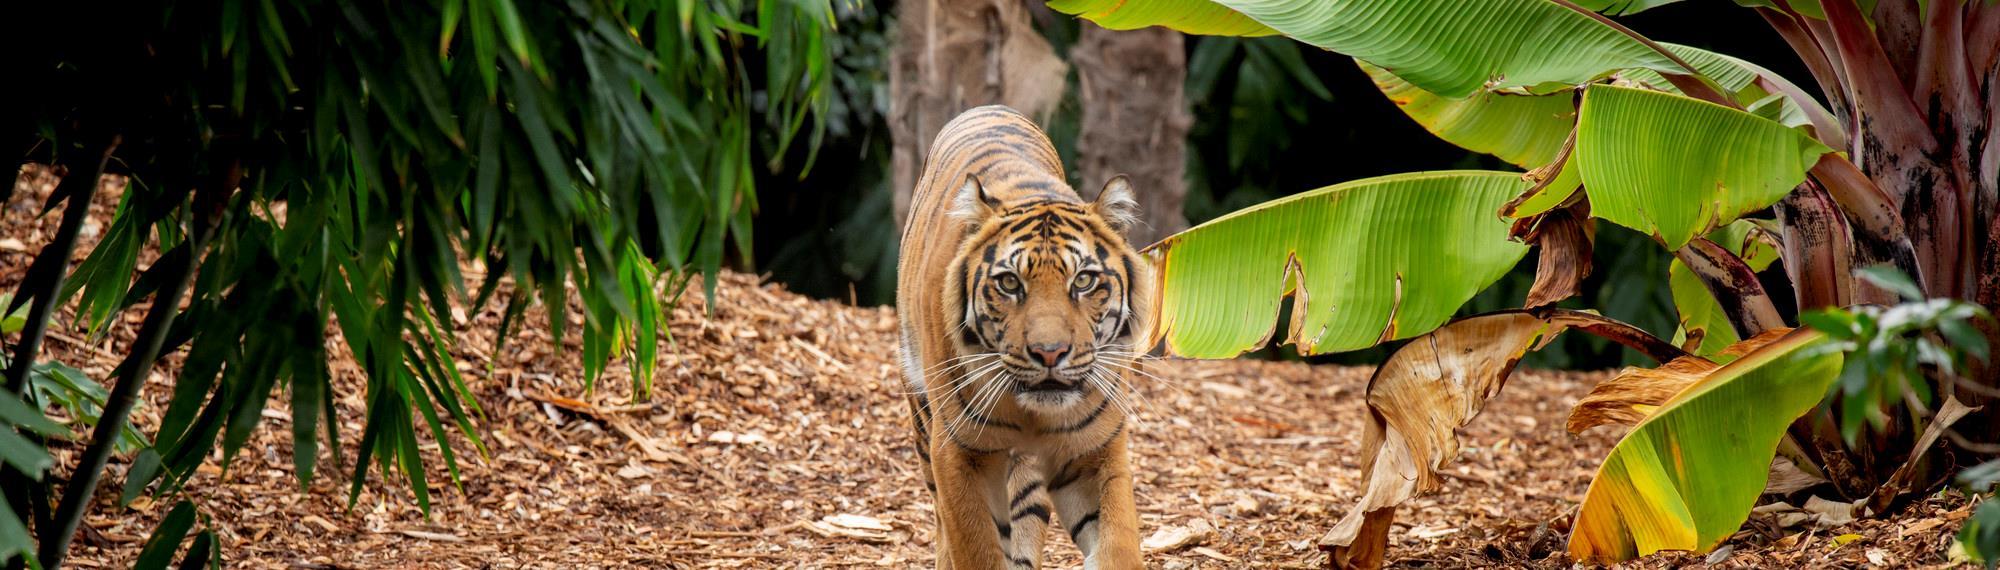 Tiger walking through bushes directly towards camera